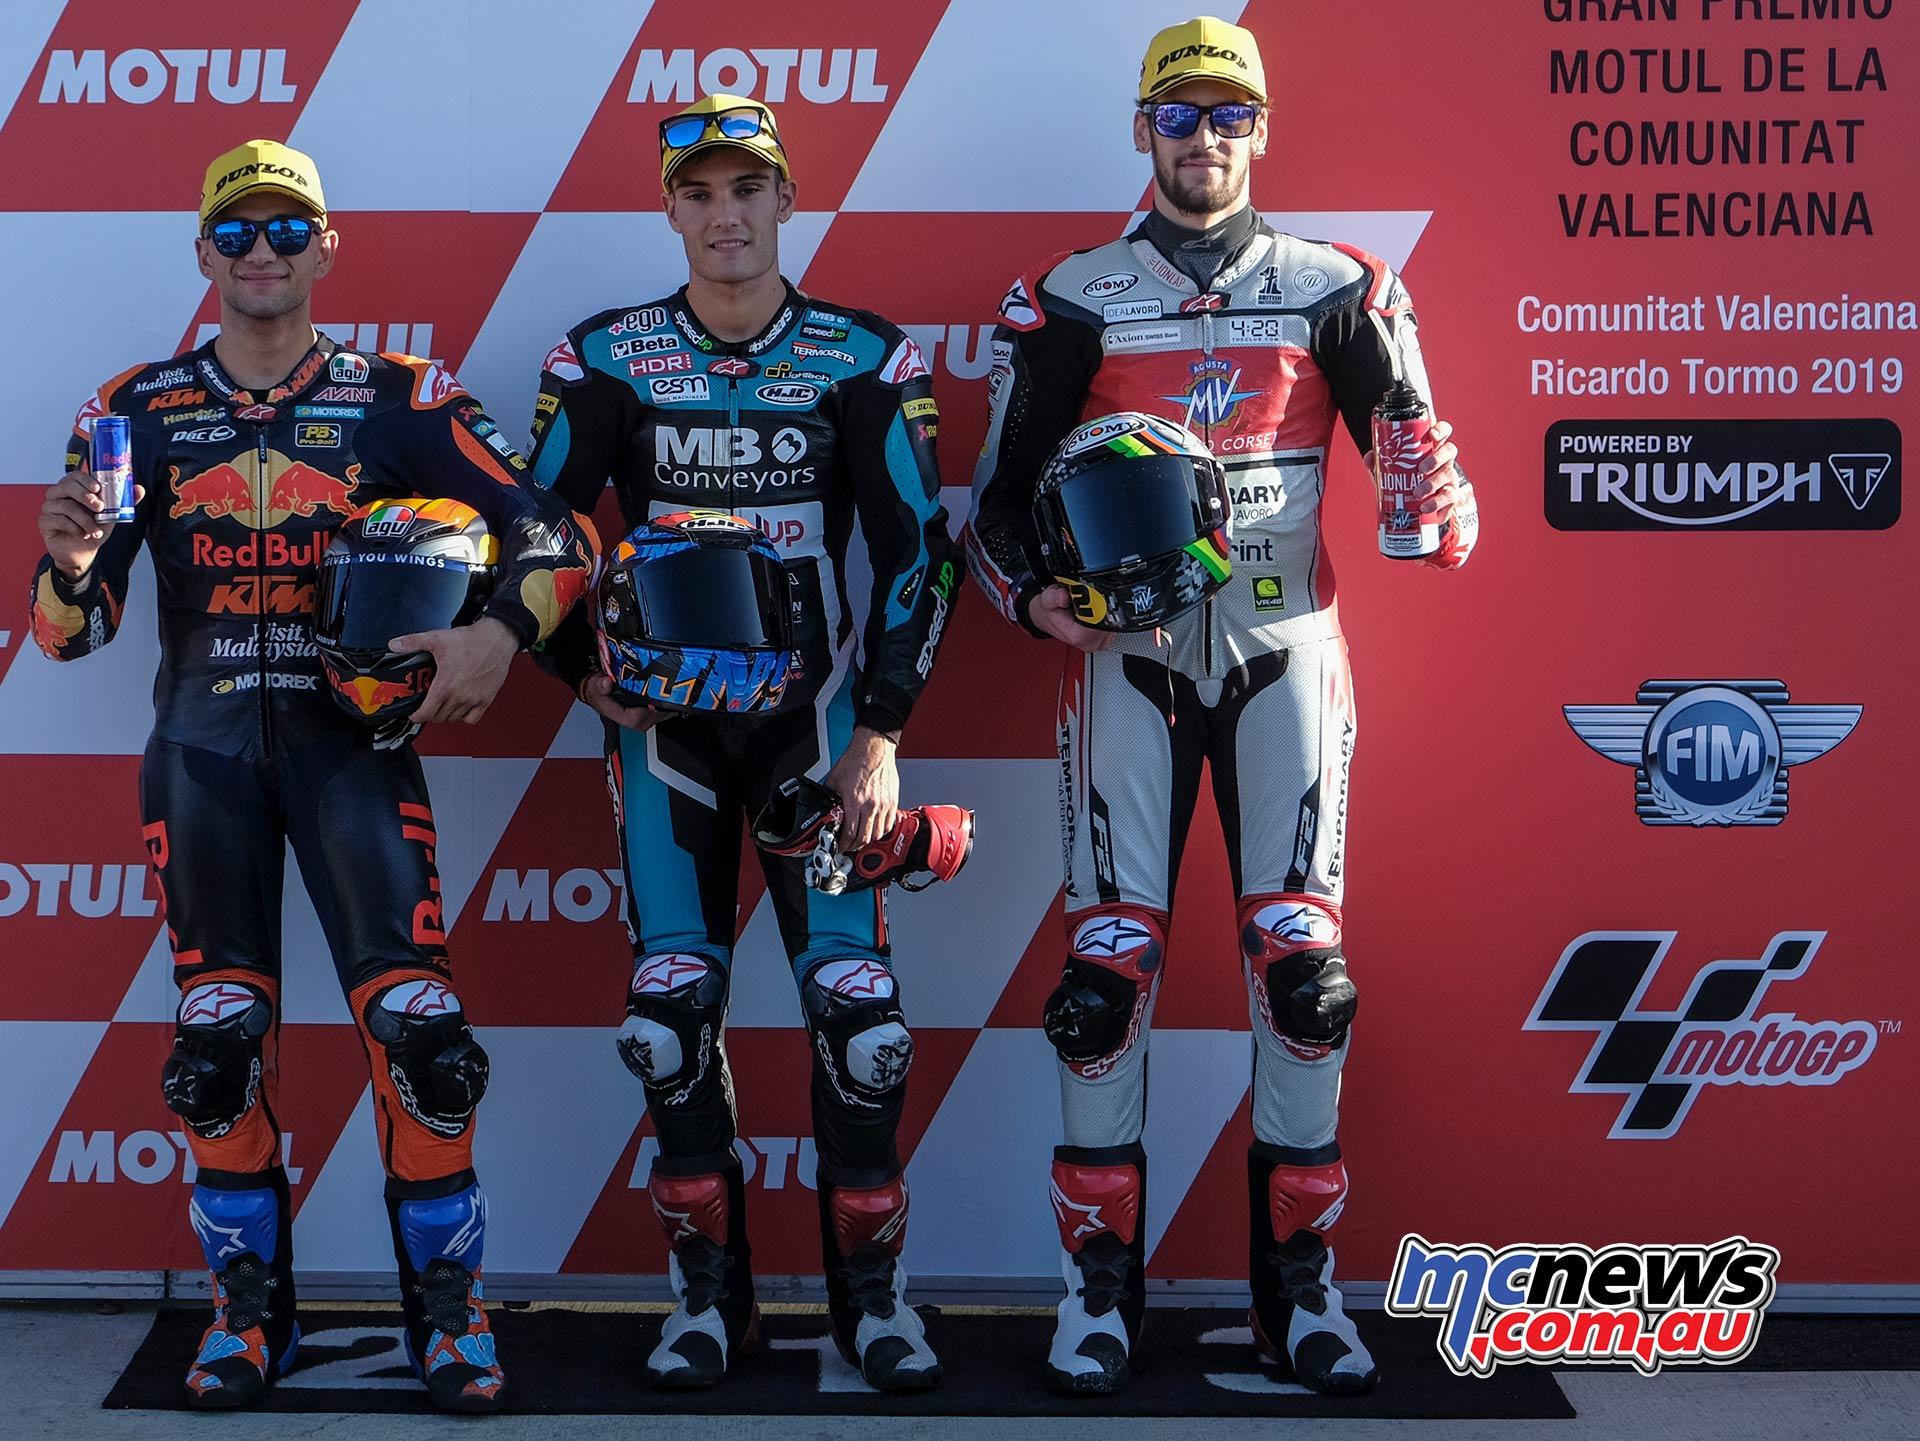 MotoGP Rnd Valencia QP Moto QP Martin Navarro Manzi